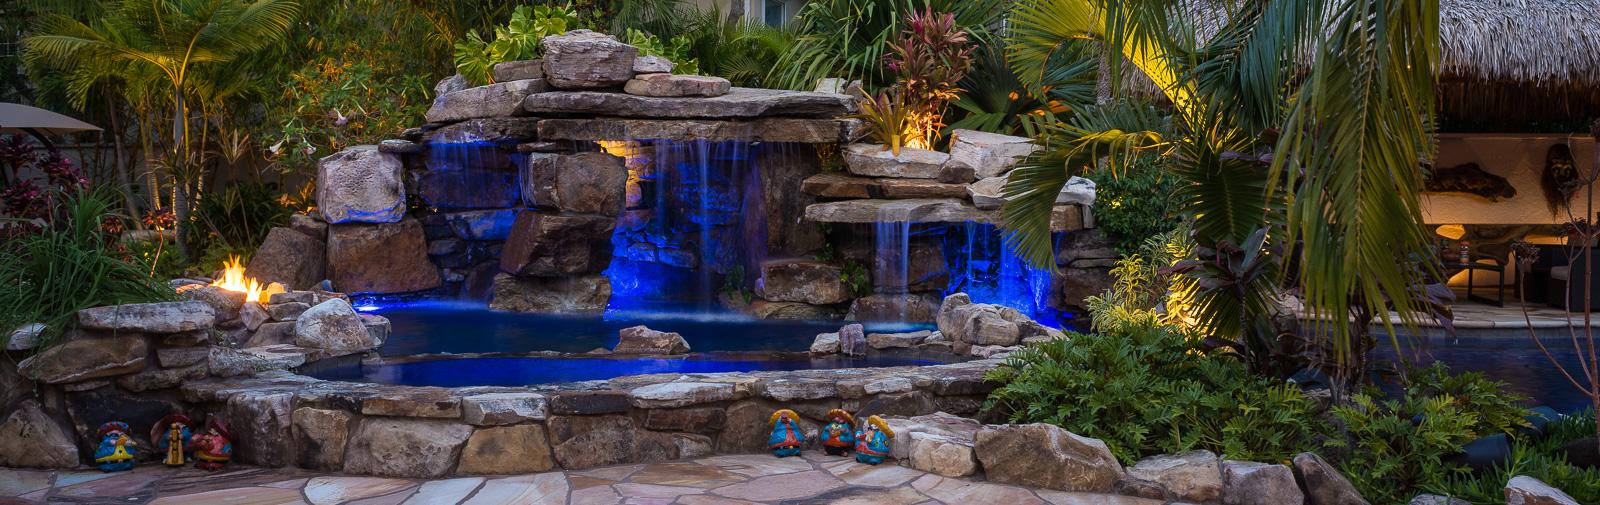 Design Waterfall Pools custom rock waterfall pool grotto spa natural stream tiki hut siesta key pools panorama